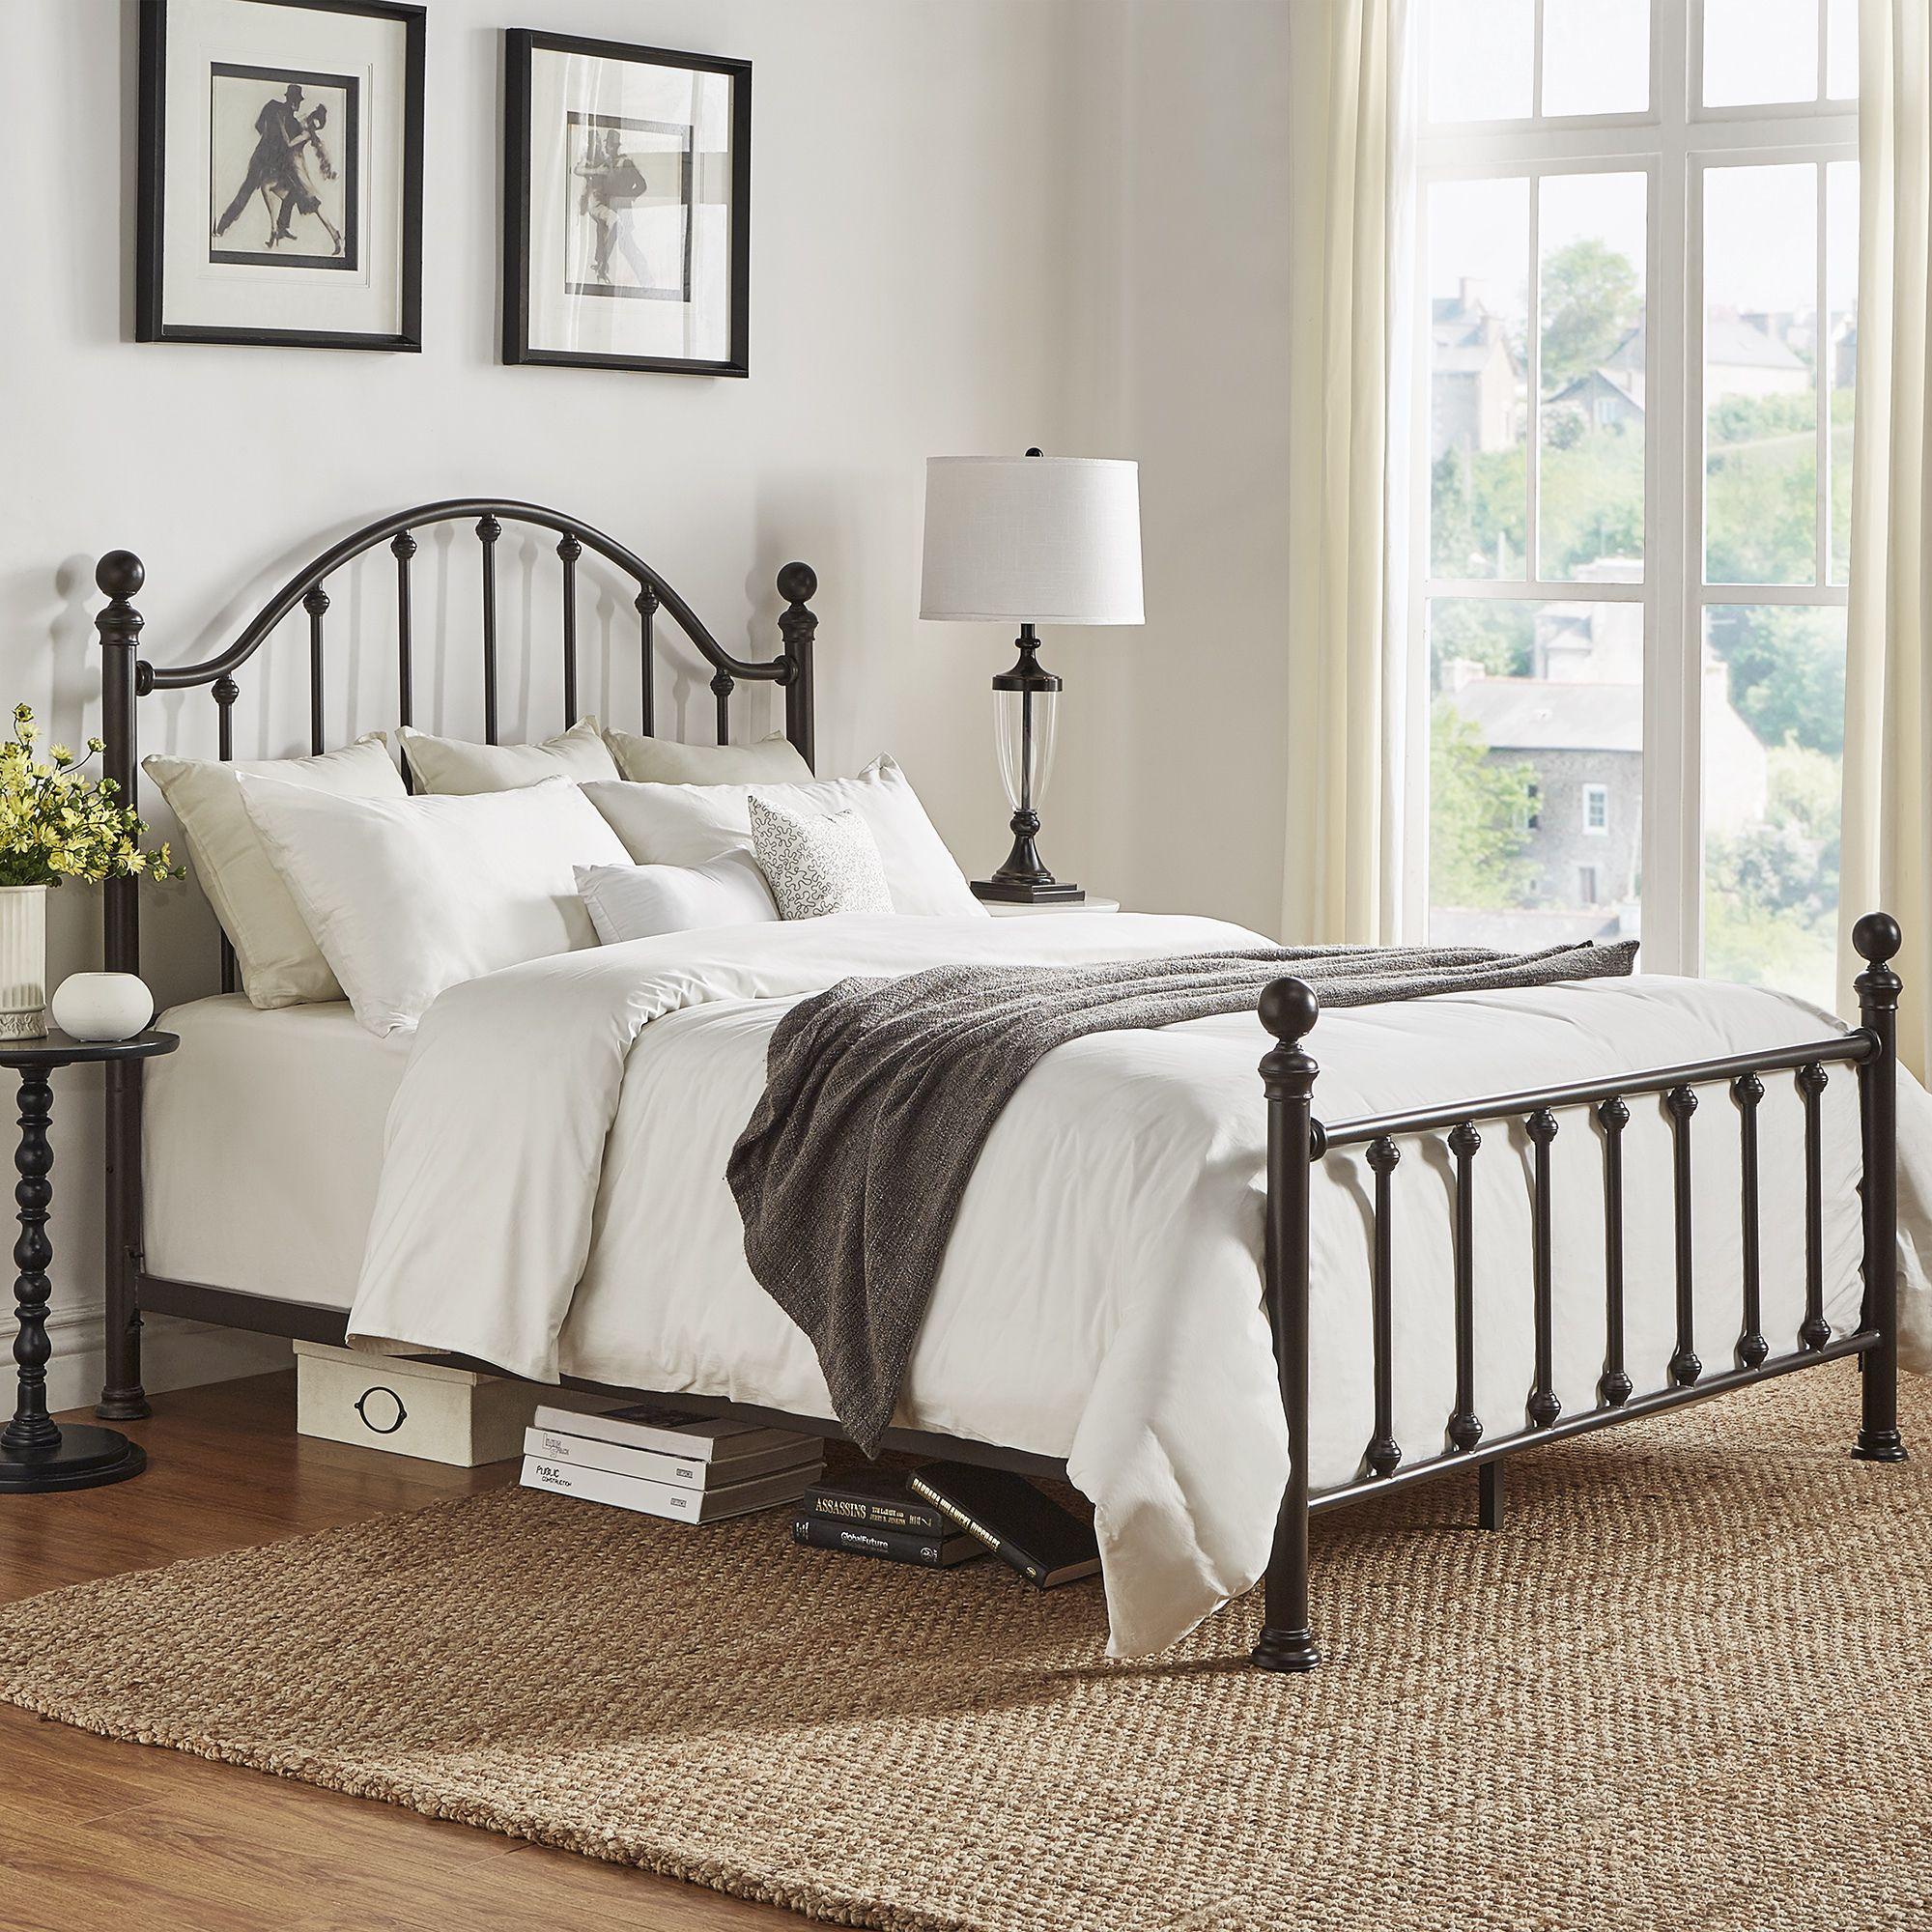 418be6a49d8f67 Tribecca Home Barnes Dark Bronze Victorian Metal Bed ([Queen]- Dark Bronze),  Black